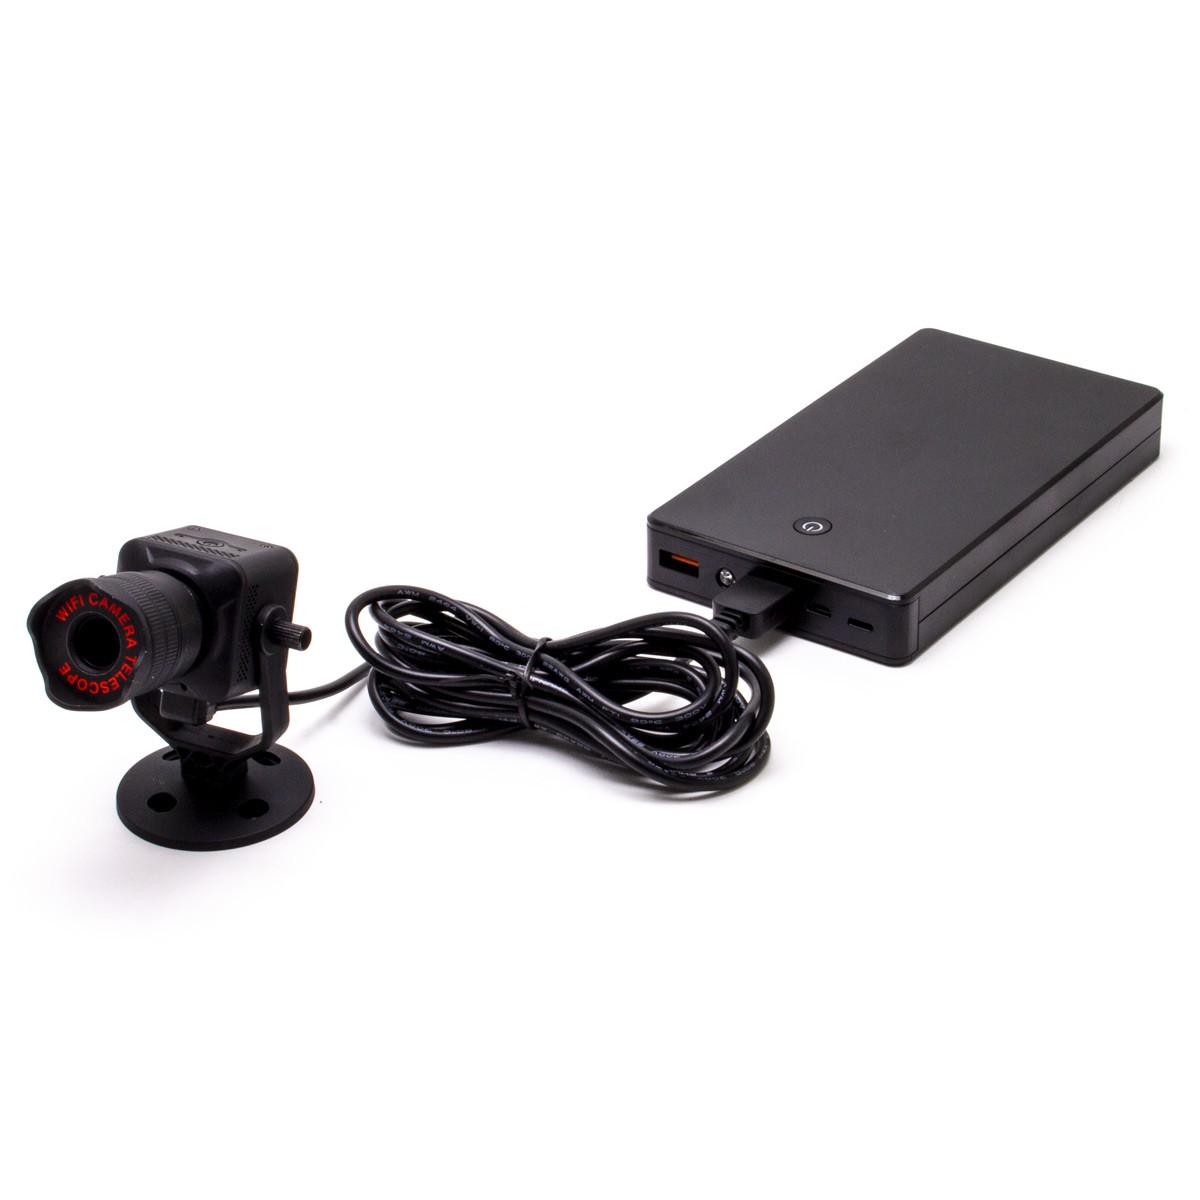 Mini caméra Wi-Fi avec zoom 50X HD 720P avec enregistrement